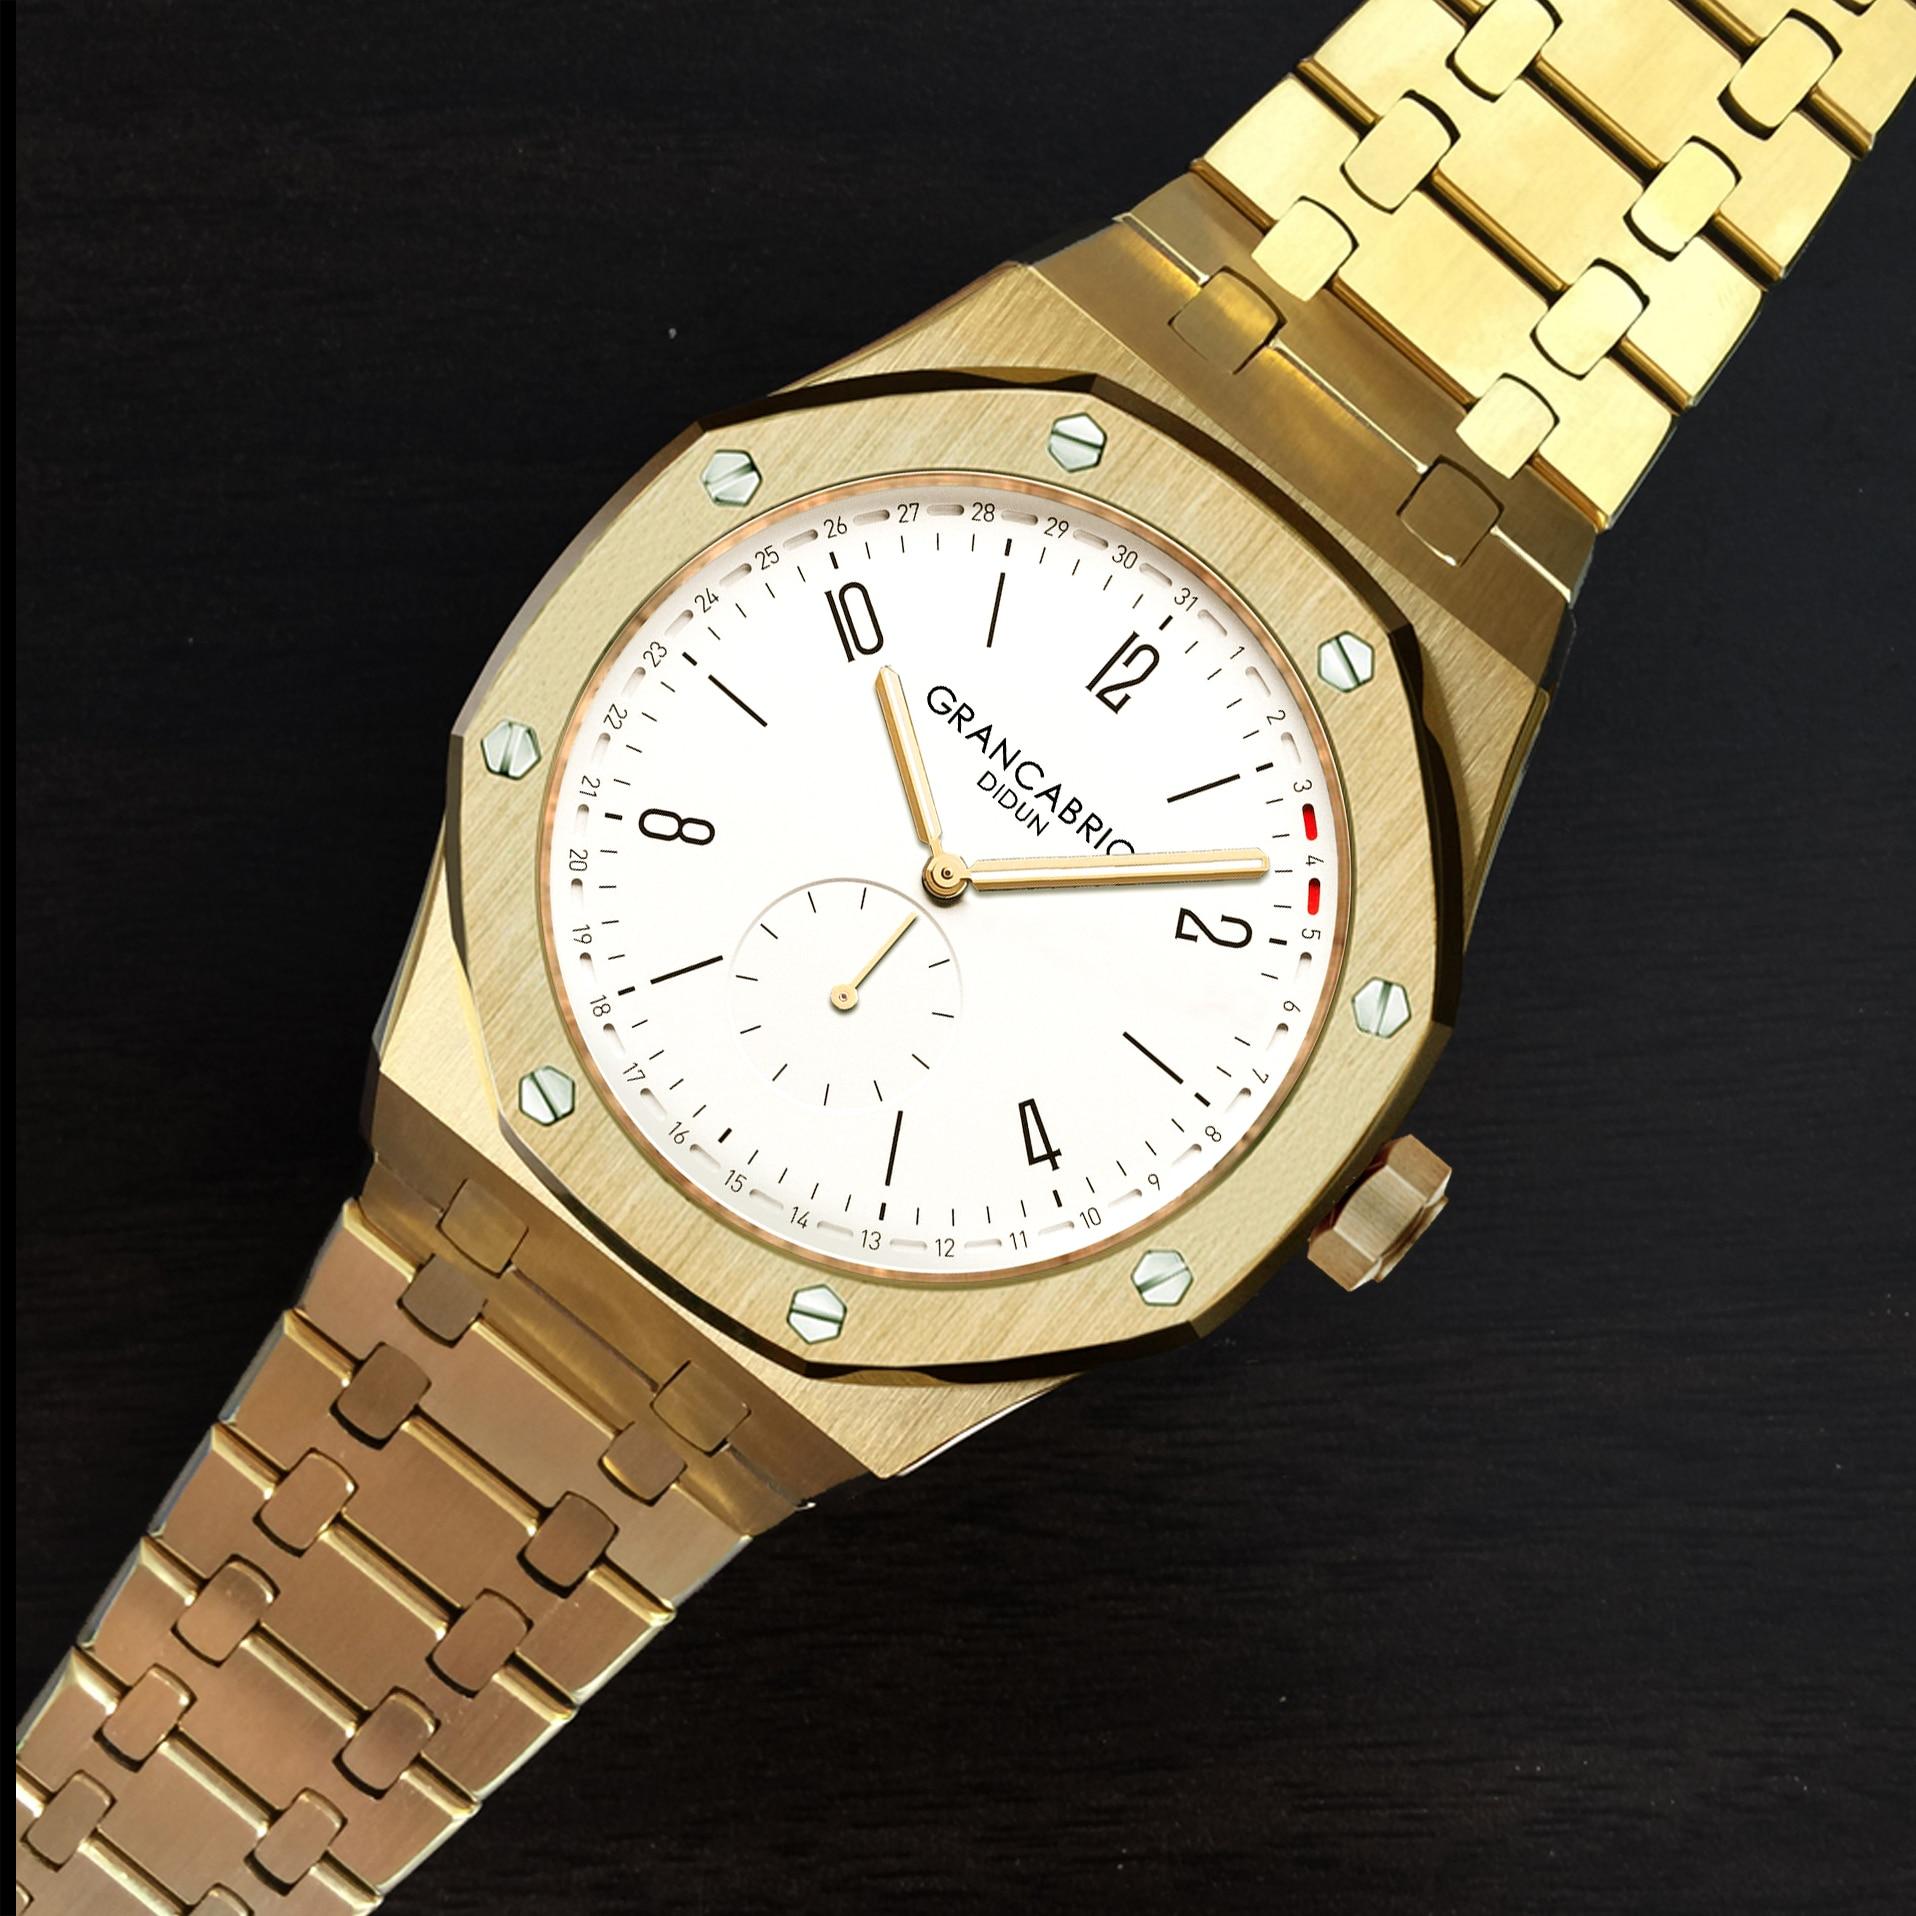 oDIDUN watch Mens Top Brand Luxury Watch Men Military Watch Shockproof 30m Waterproof Business Luminous Quartz Stainless steel-in Quartz Watches from Watches    3